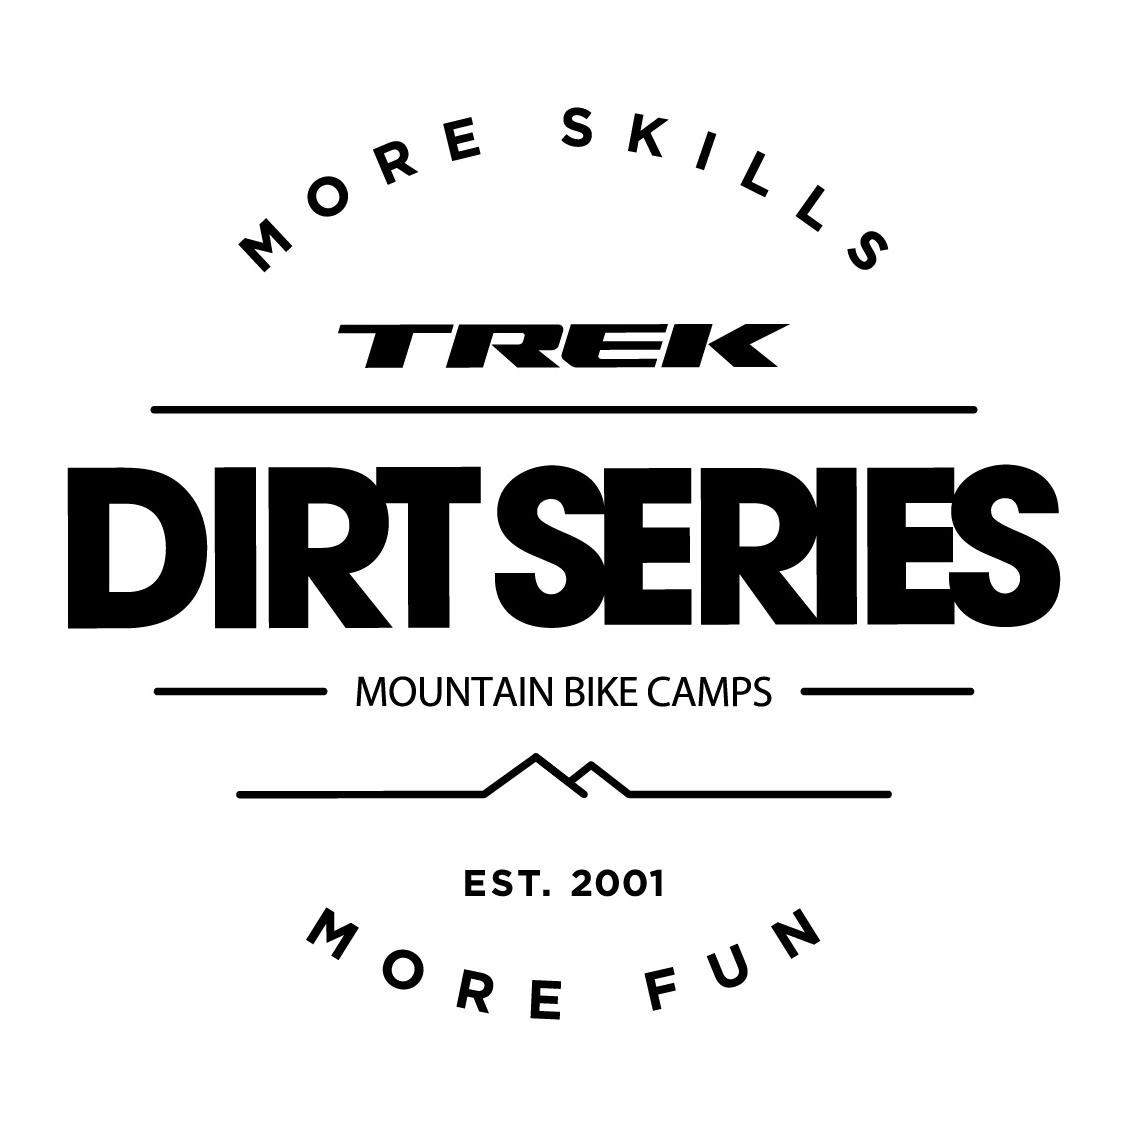 Dirt Series Mountain Bike Camp